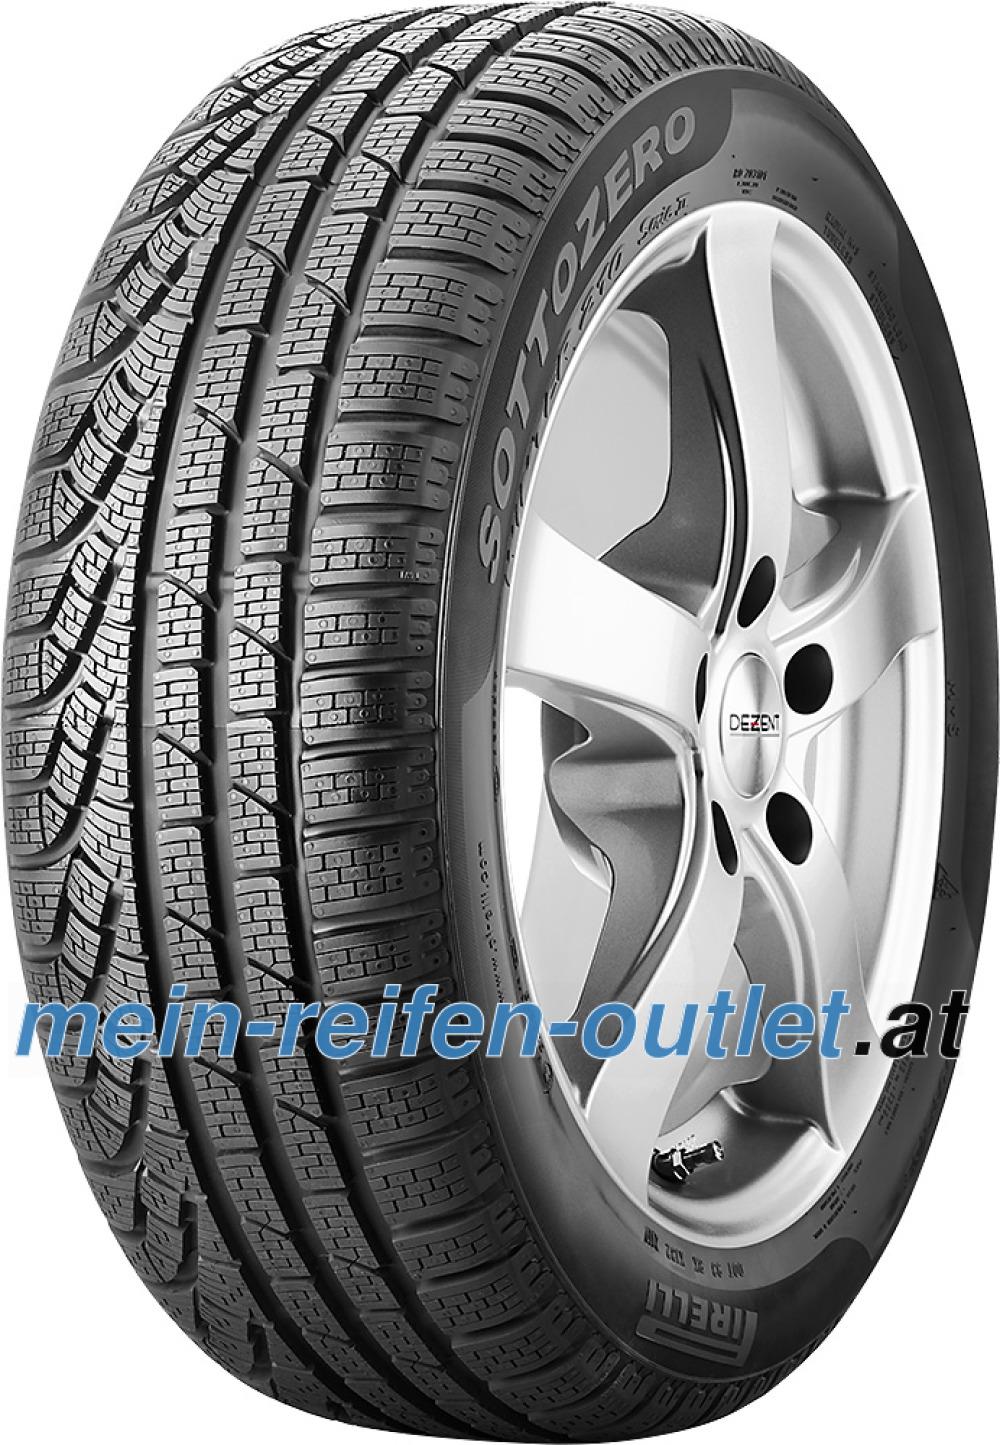 Pirelli W 210 SottoZero S2 ( 225/60 R17 99H *, mit Felgenschutz (MFS) )